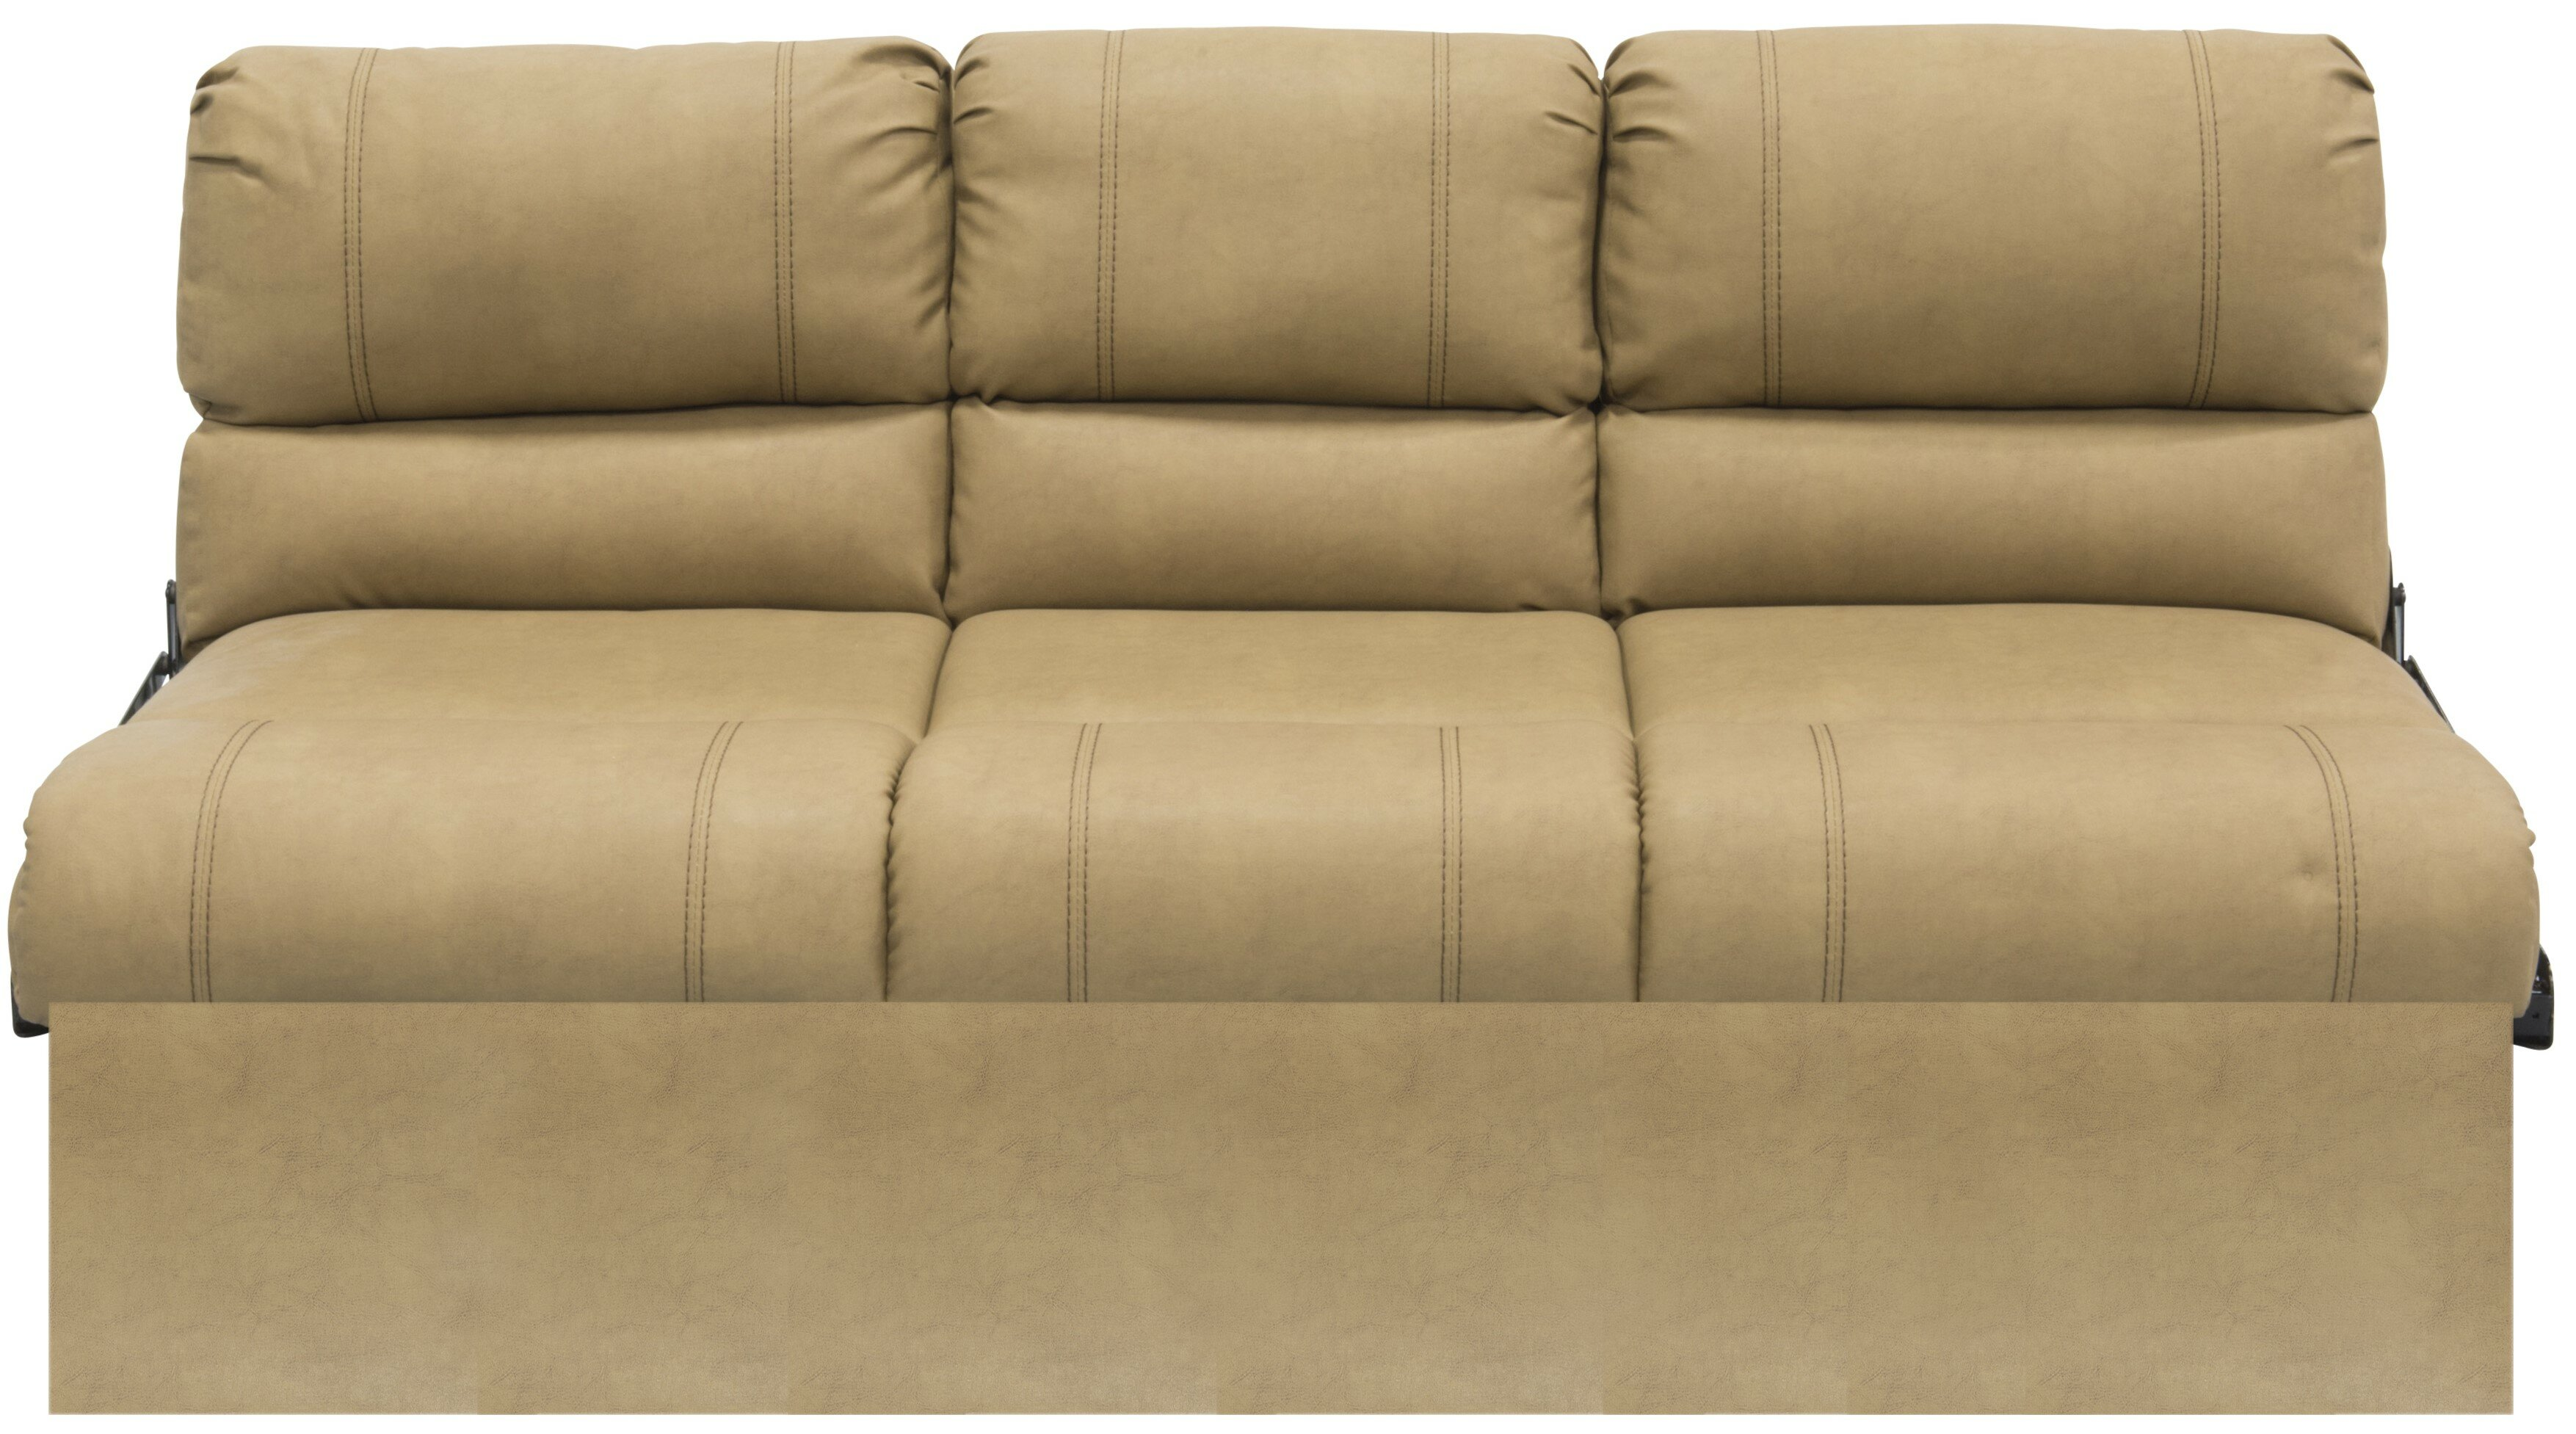 Ebern Designs Jackknife Sofa Bed